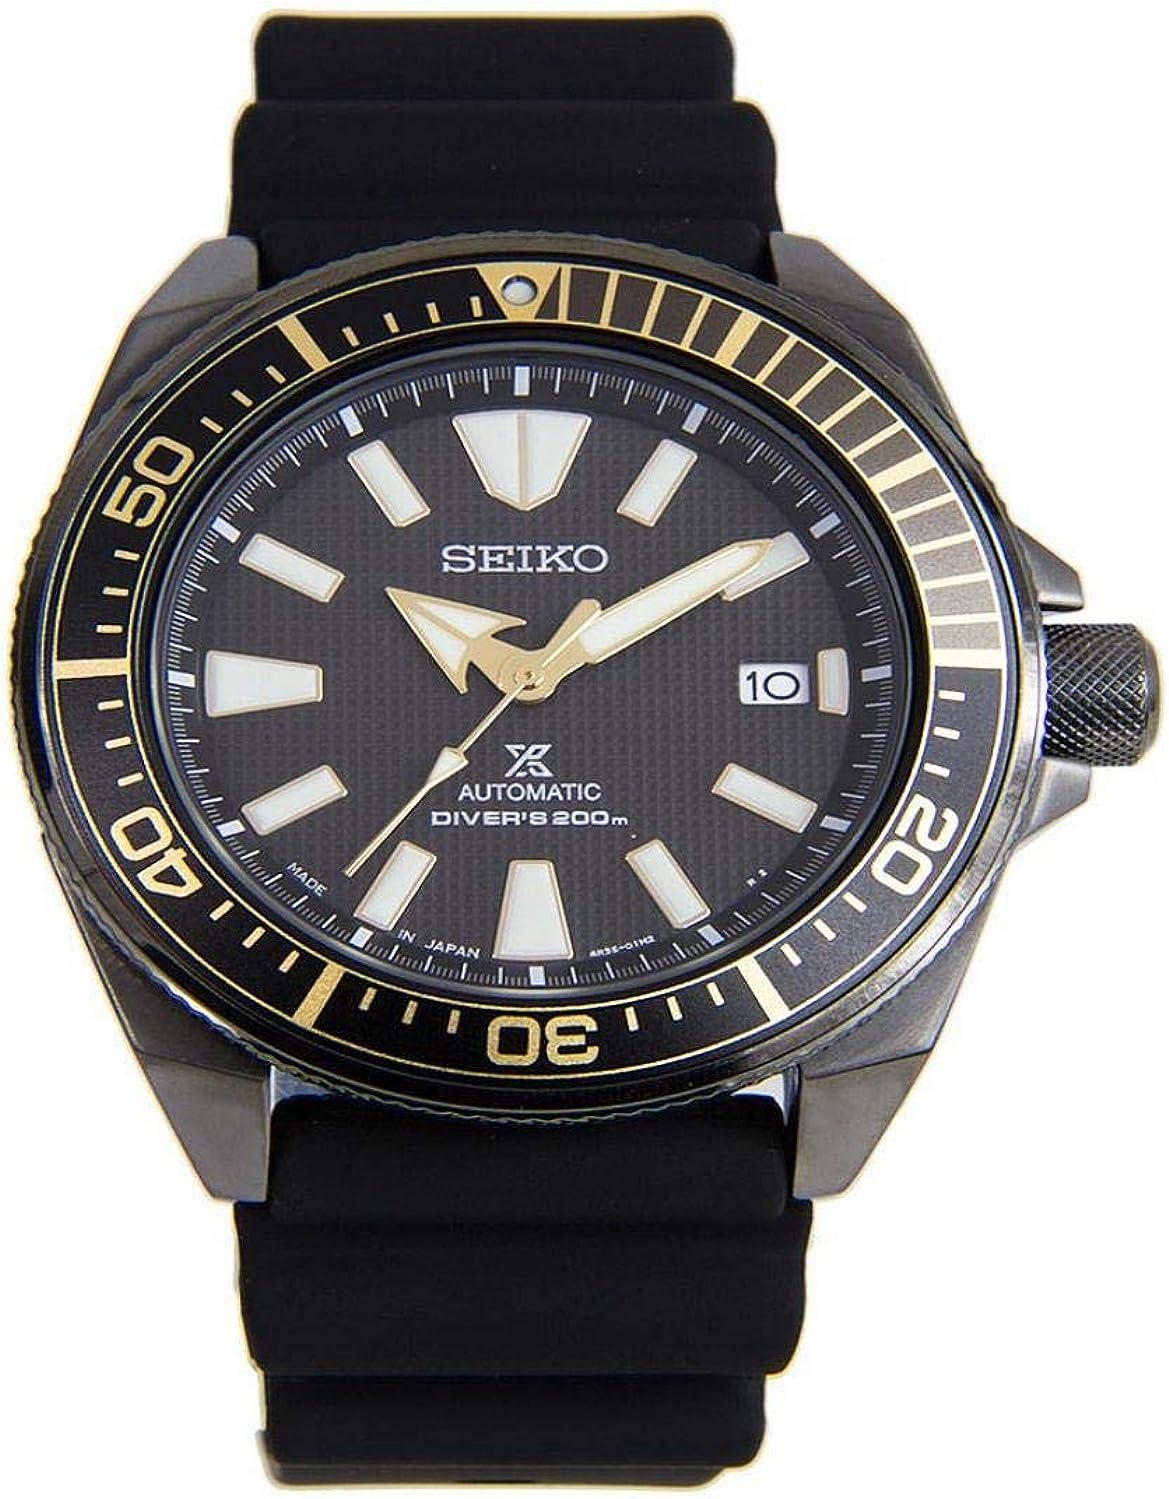 Seiko Pro Diver Samurai Automatic Black Dial with Rubber Buckle Strap SRPB55J1